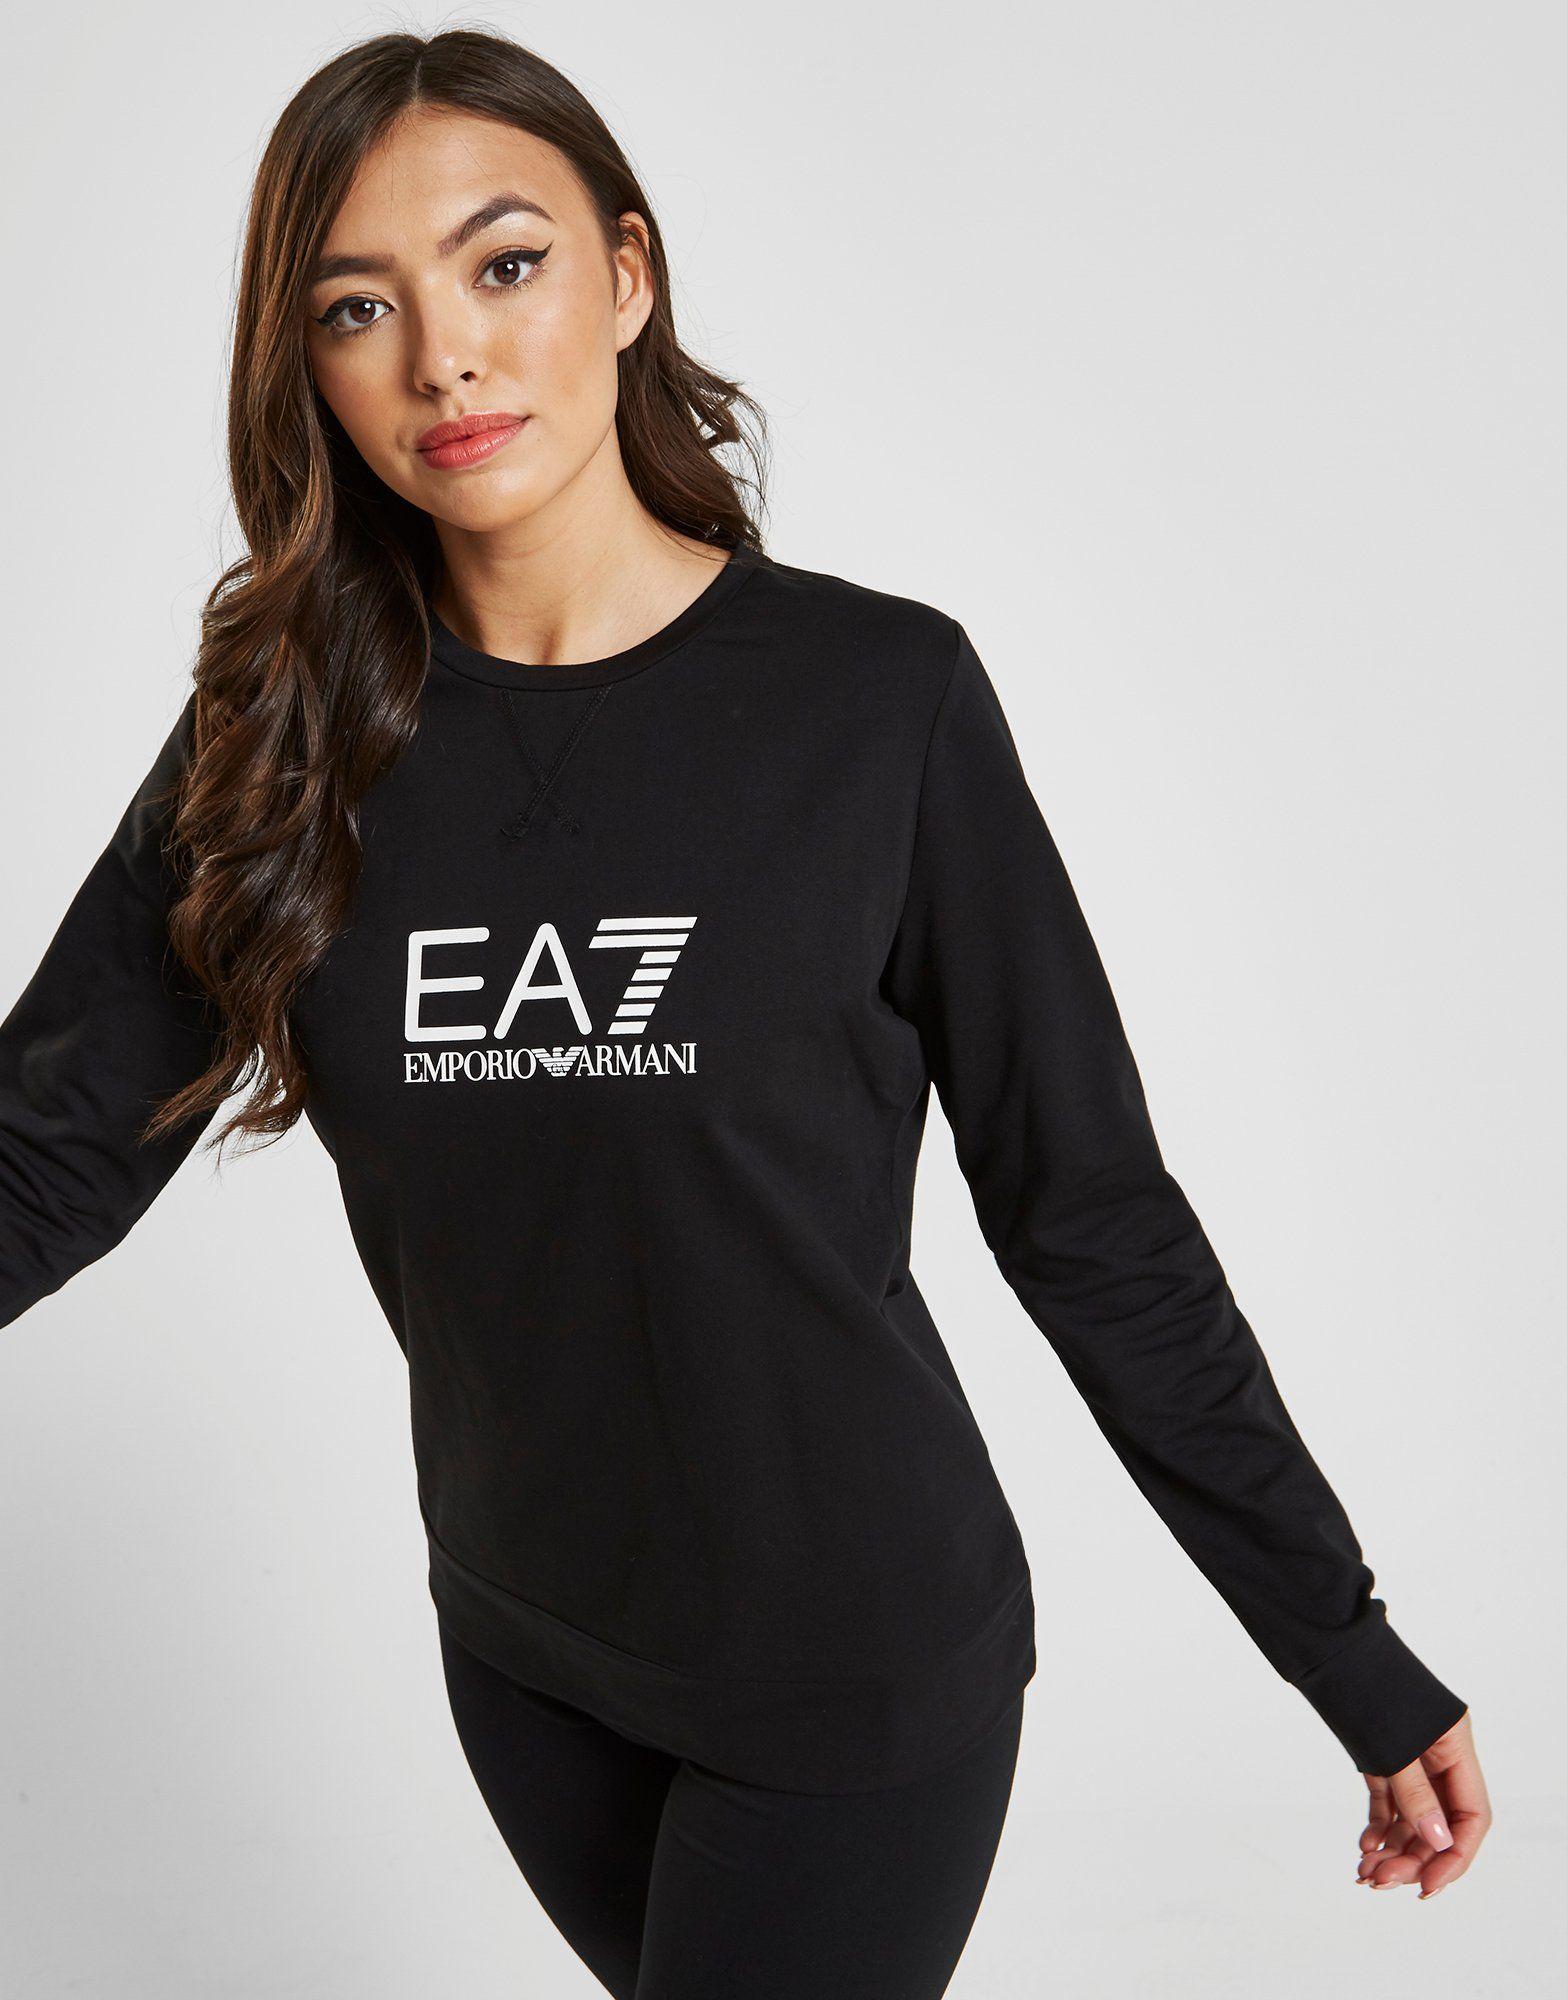 60315941 Emporio Armani EA7 Core Crew Sweatshirt | JD Sports